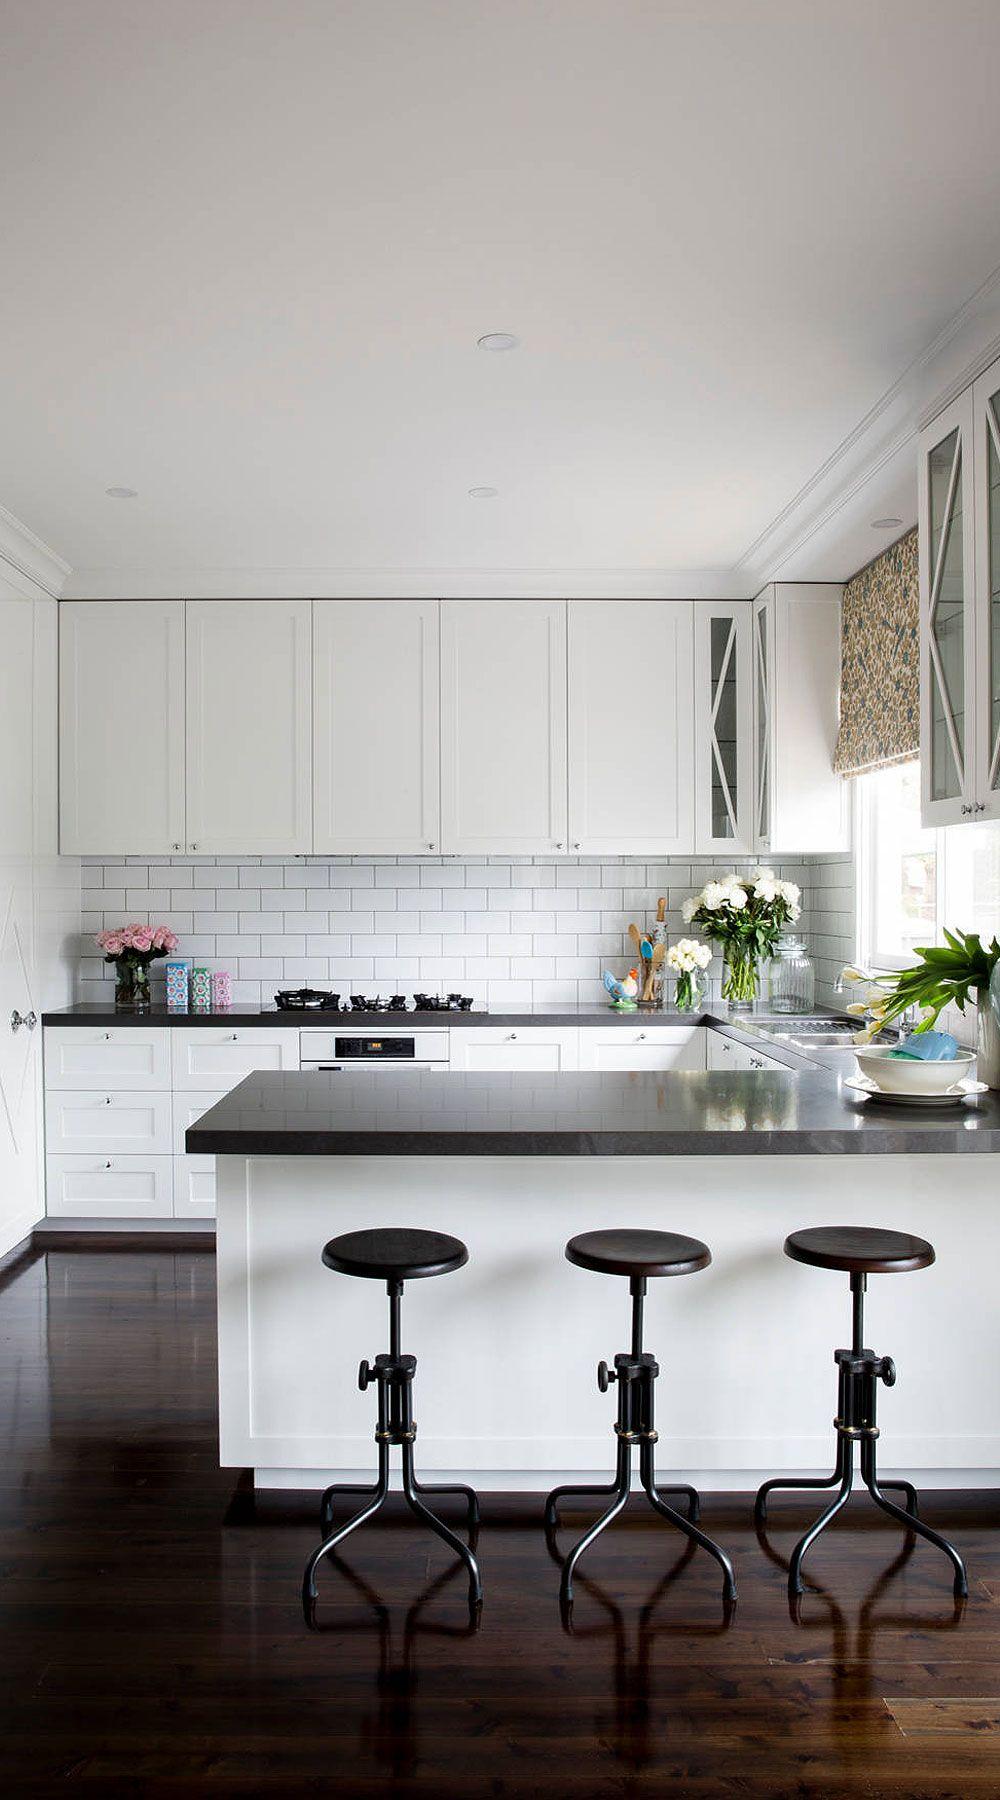 50 black countertop backsplash ideas tile designs tips advice in 2020 countertop on kitchen decor black countertop id=76043